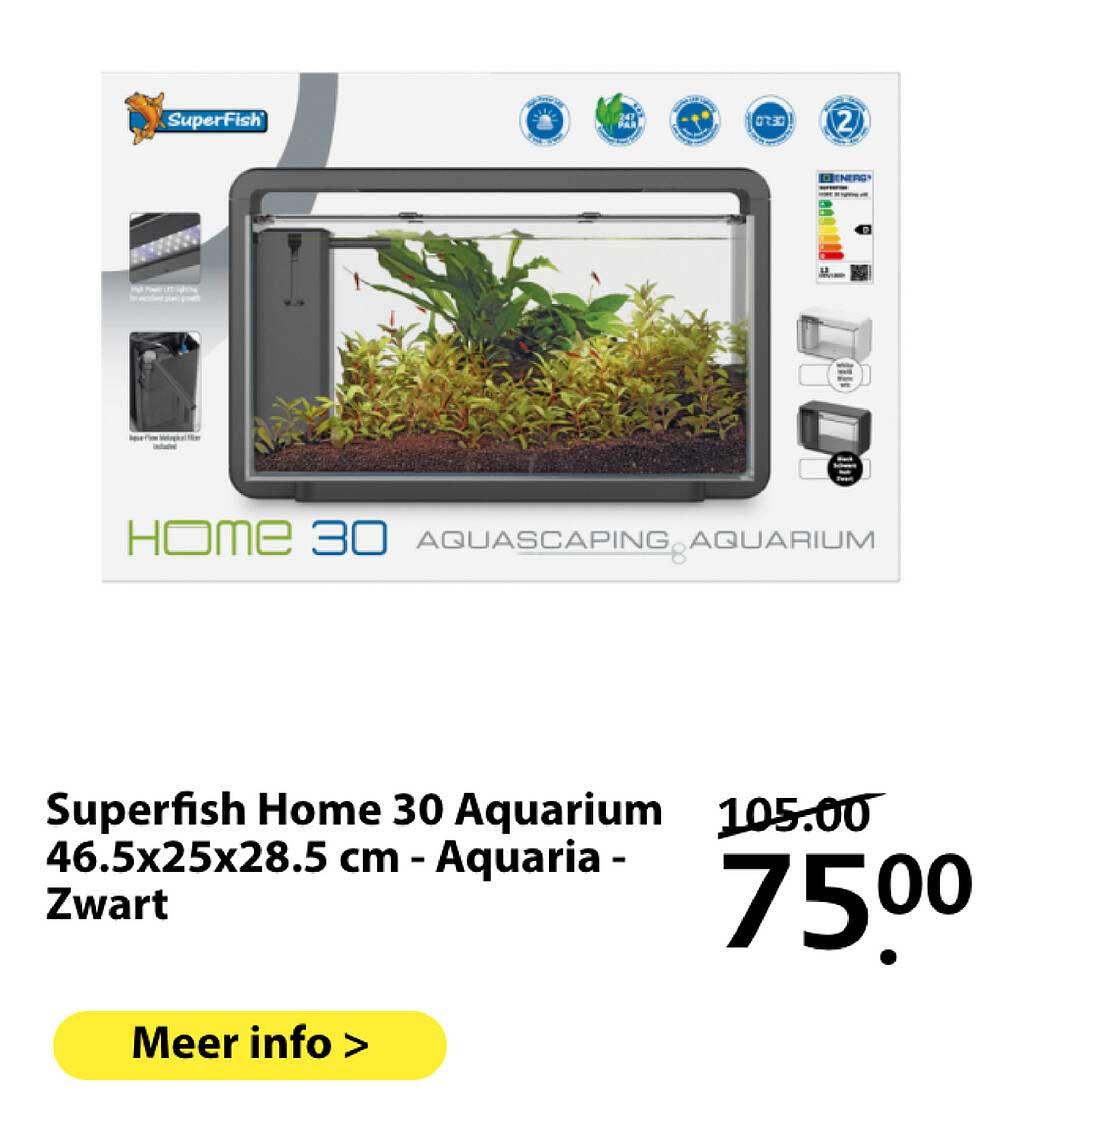 Boerenbond Superfish Home 30 Aquarium 46.5x25x28.5 Cm - Aquaria - Zwart